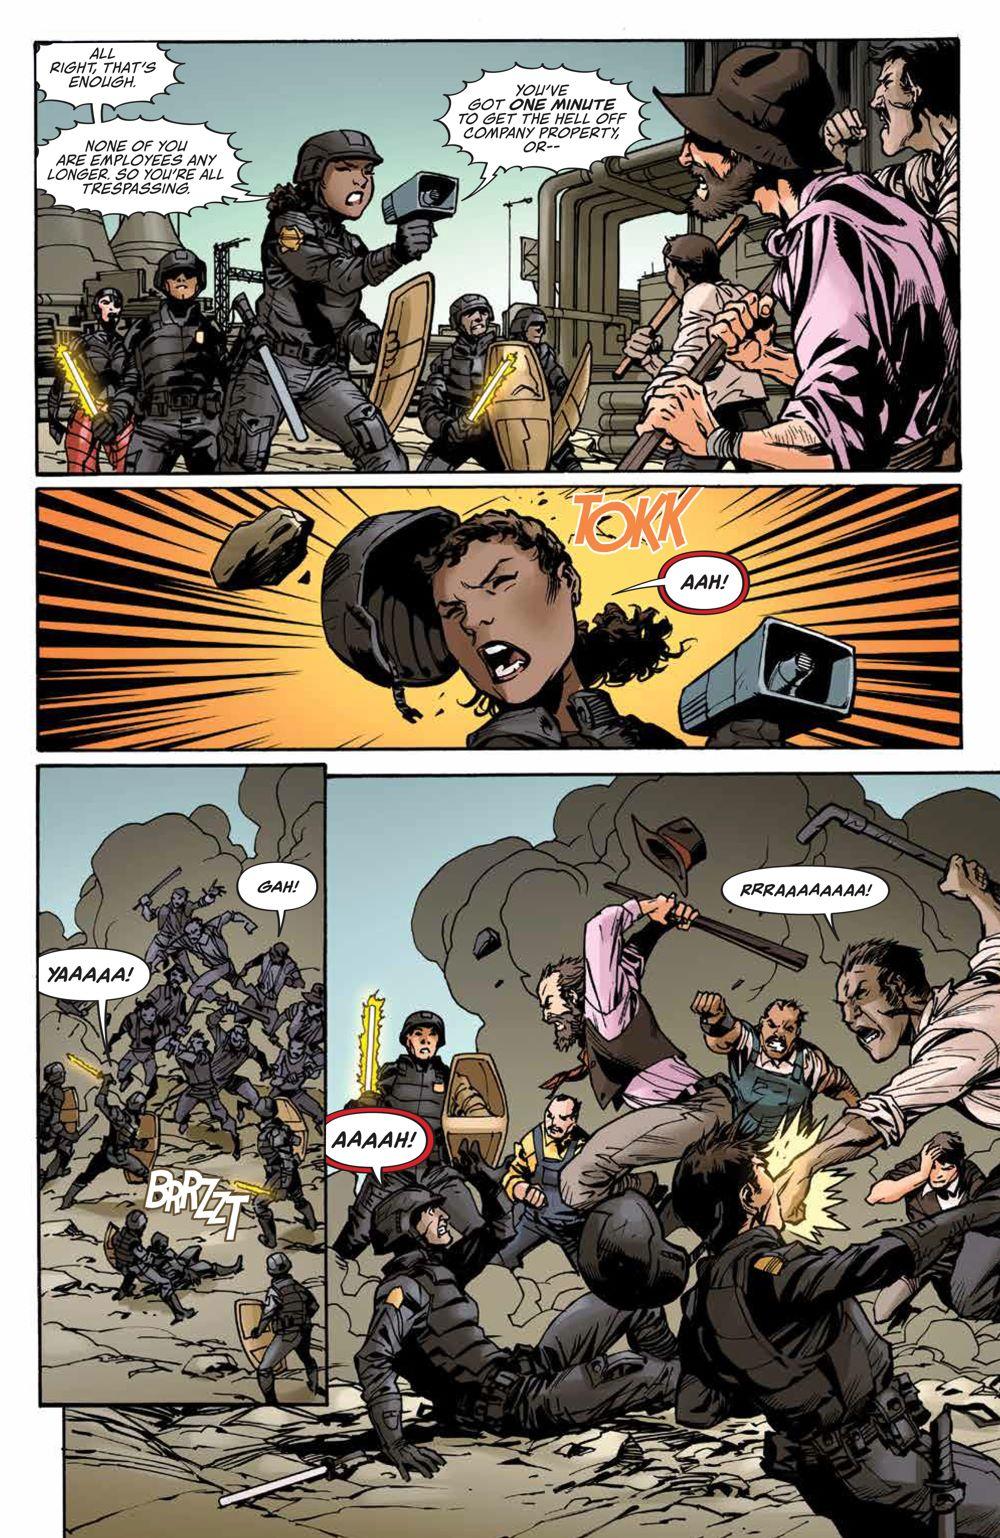 Firefly_NewSheriffVerse_v2_HC_PRESS_15 ComicList Previews: FIREFLY NEW SHERIFF IN THE 'VERSE VOLUME 2 HC